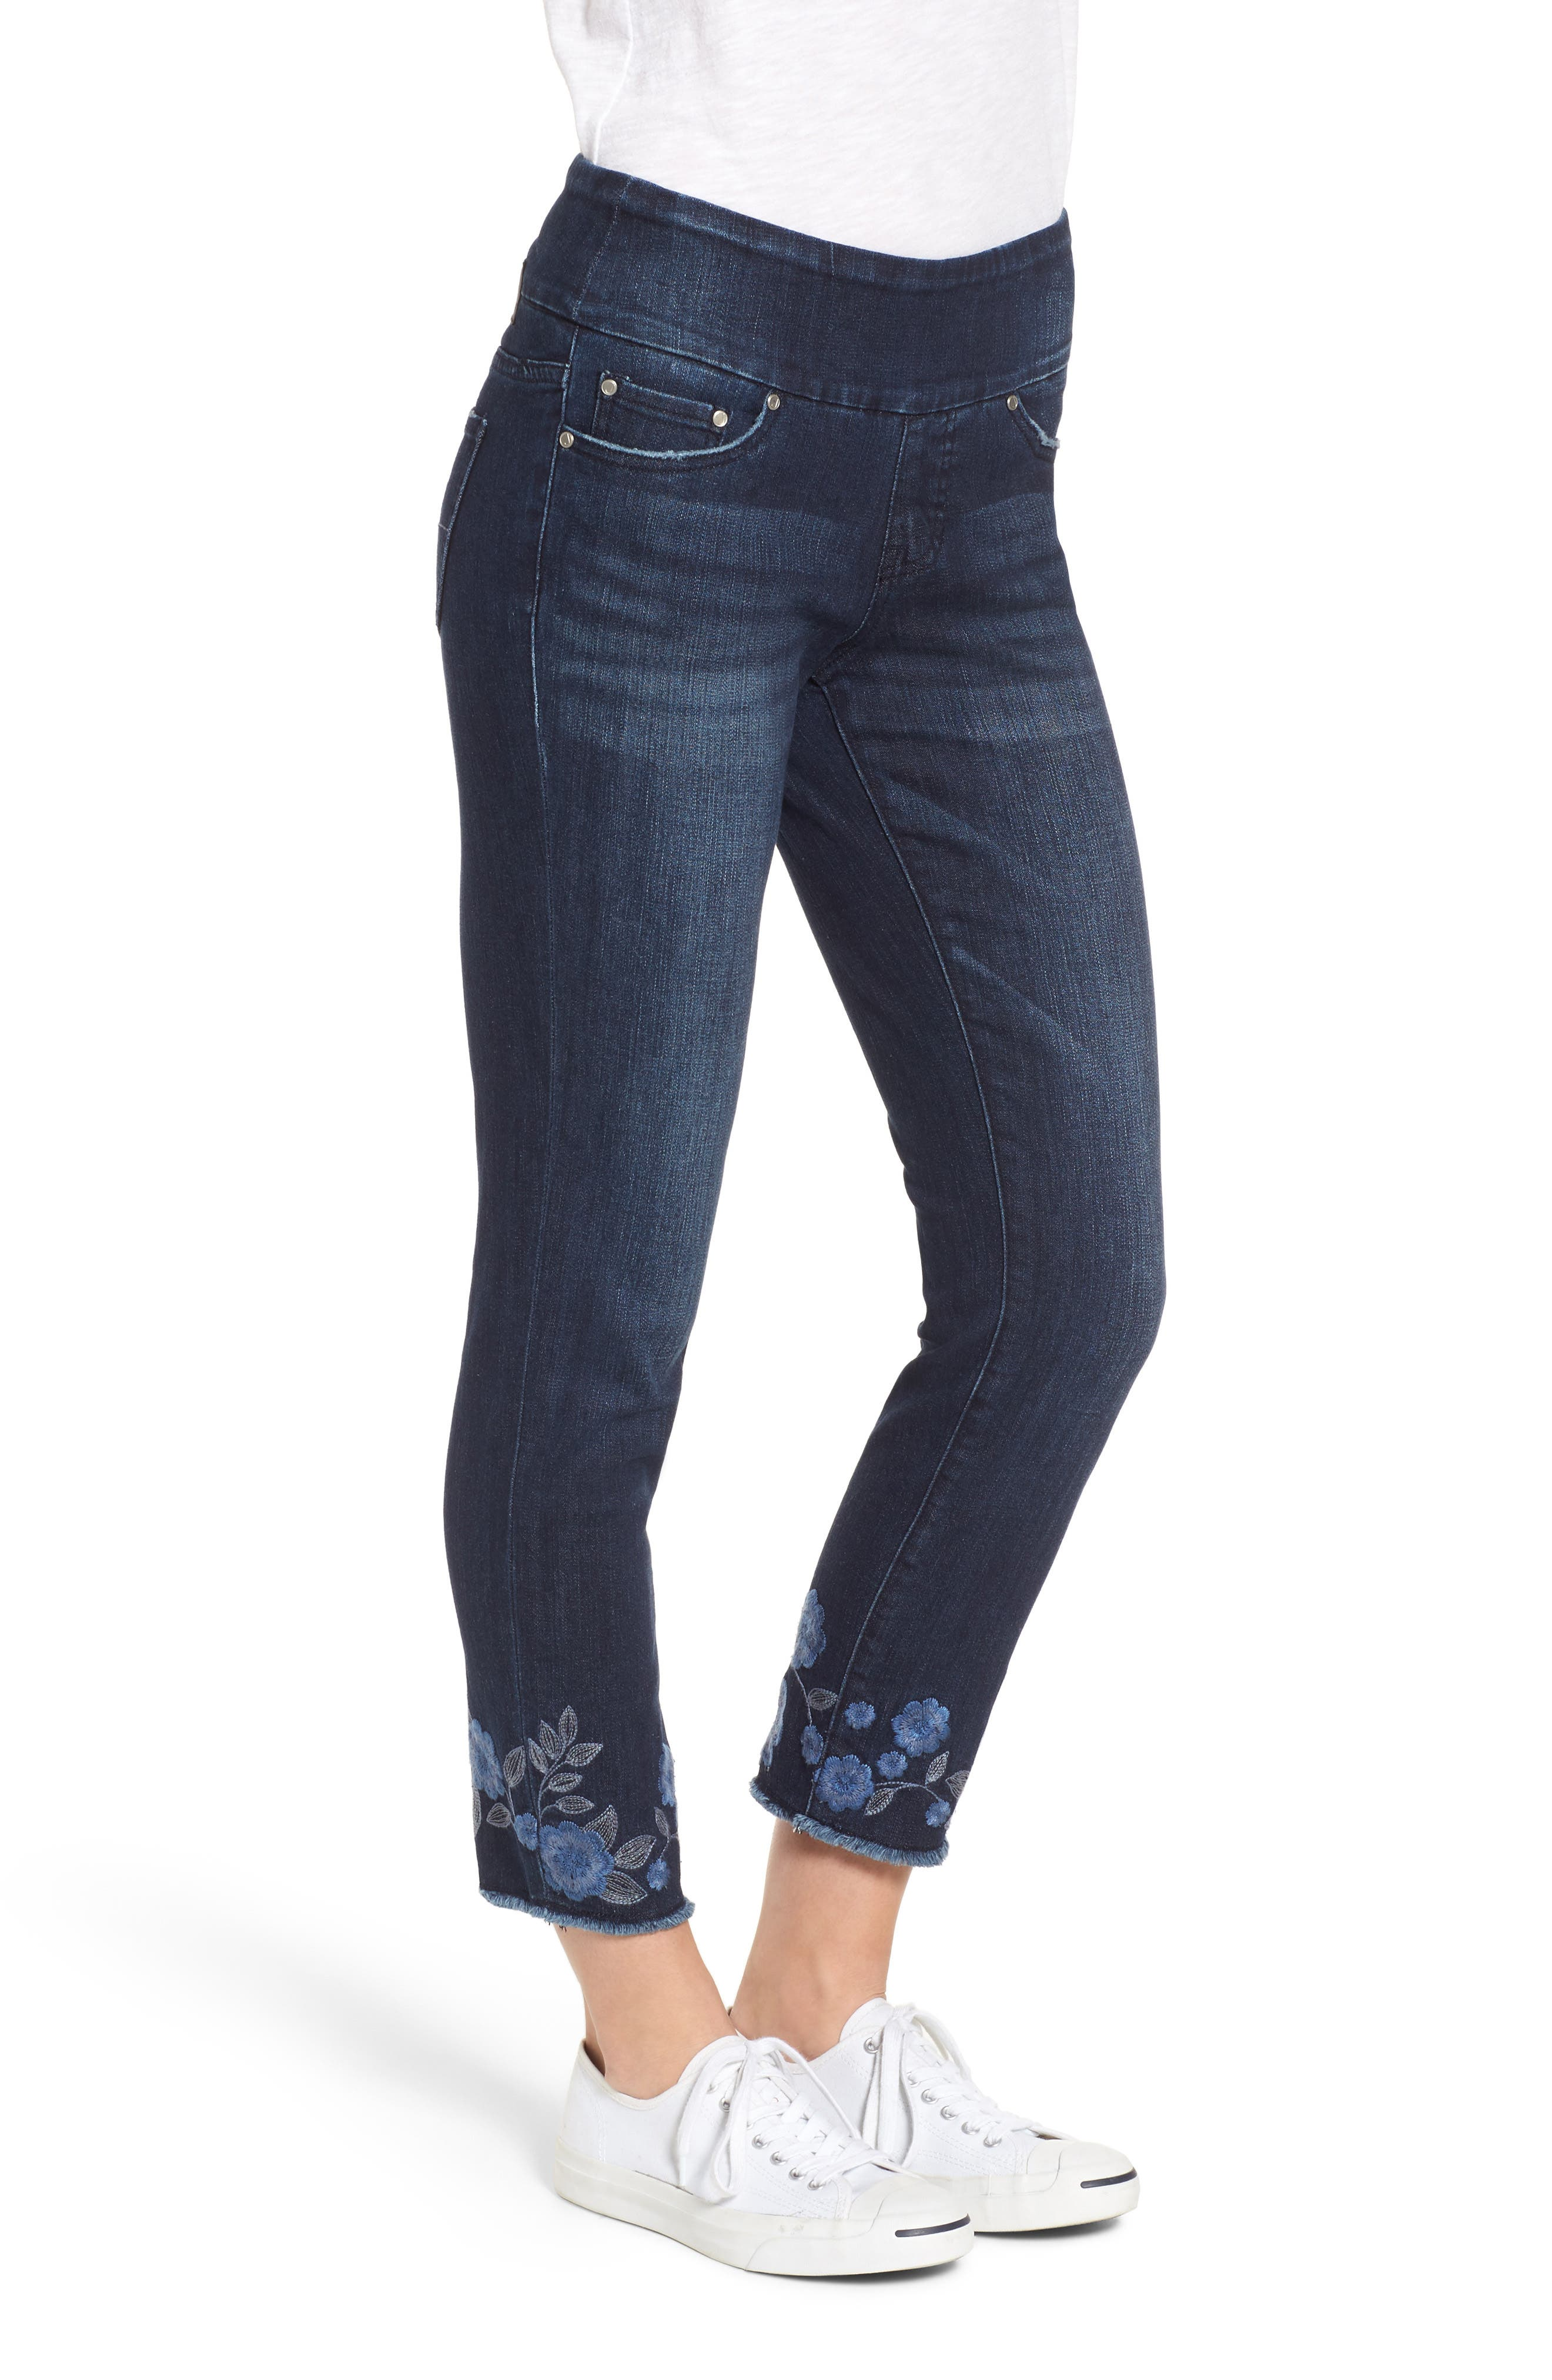 Alternate Image 3  - Jag Jeans Amelia Embroidered Slim Ankle Jeans (Meteor)